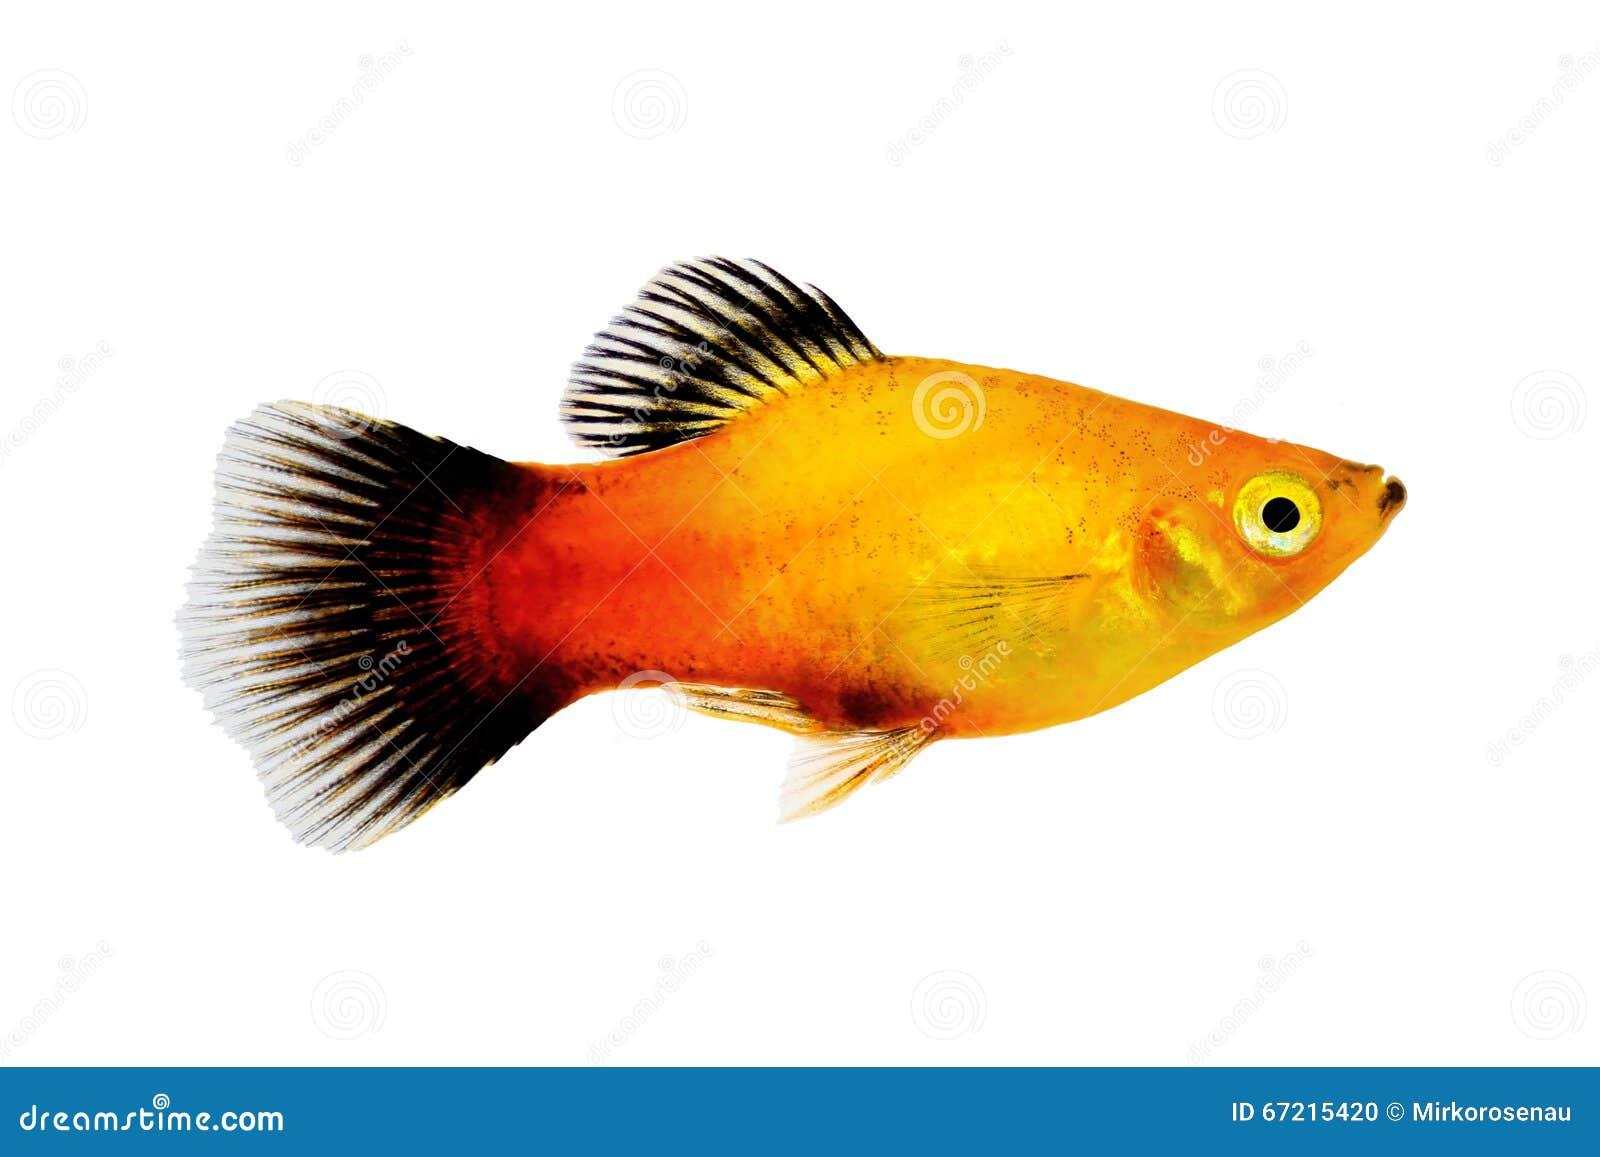 ... platy male Xiphophorus maculatus tropical aquarium fish freshwater